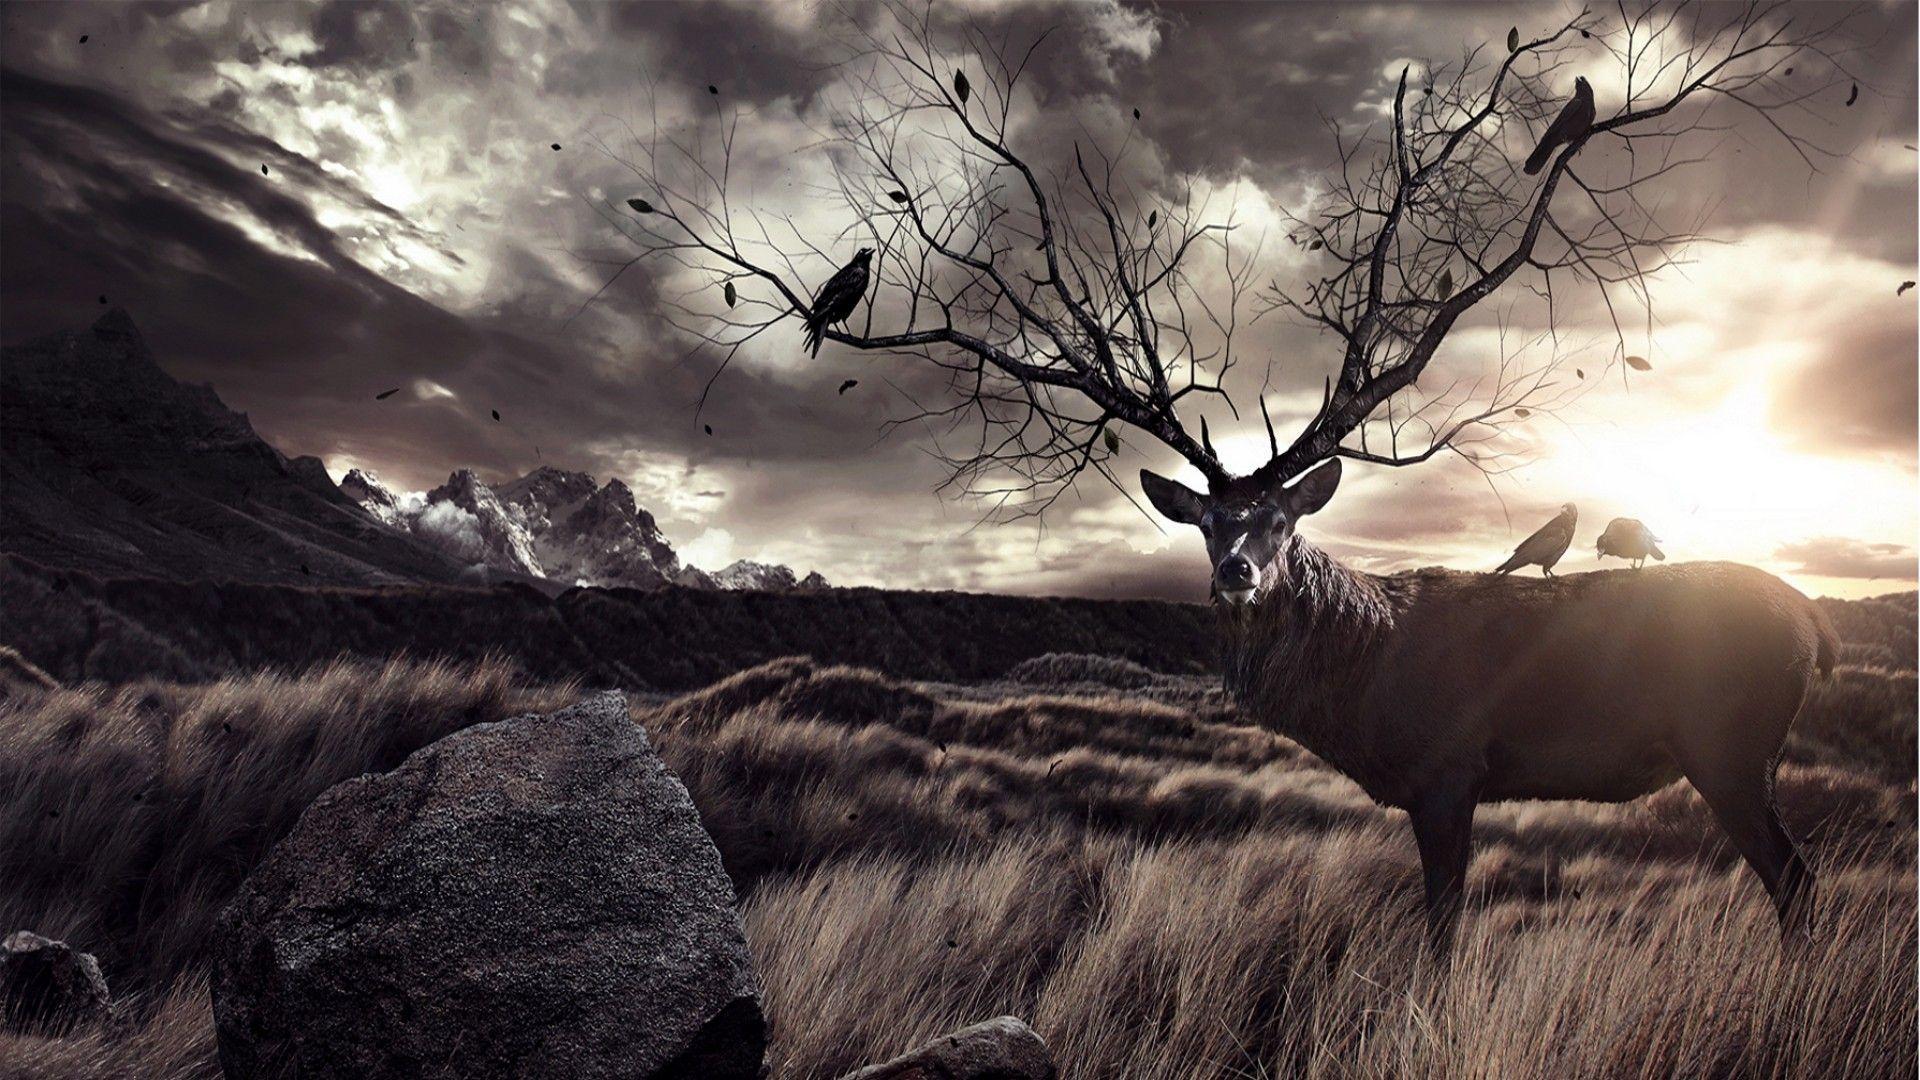 deer hunting wallpaper HD 1920x1080